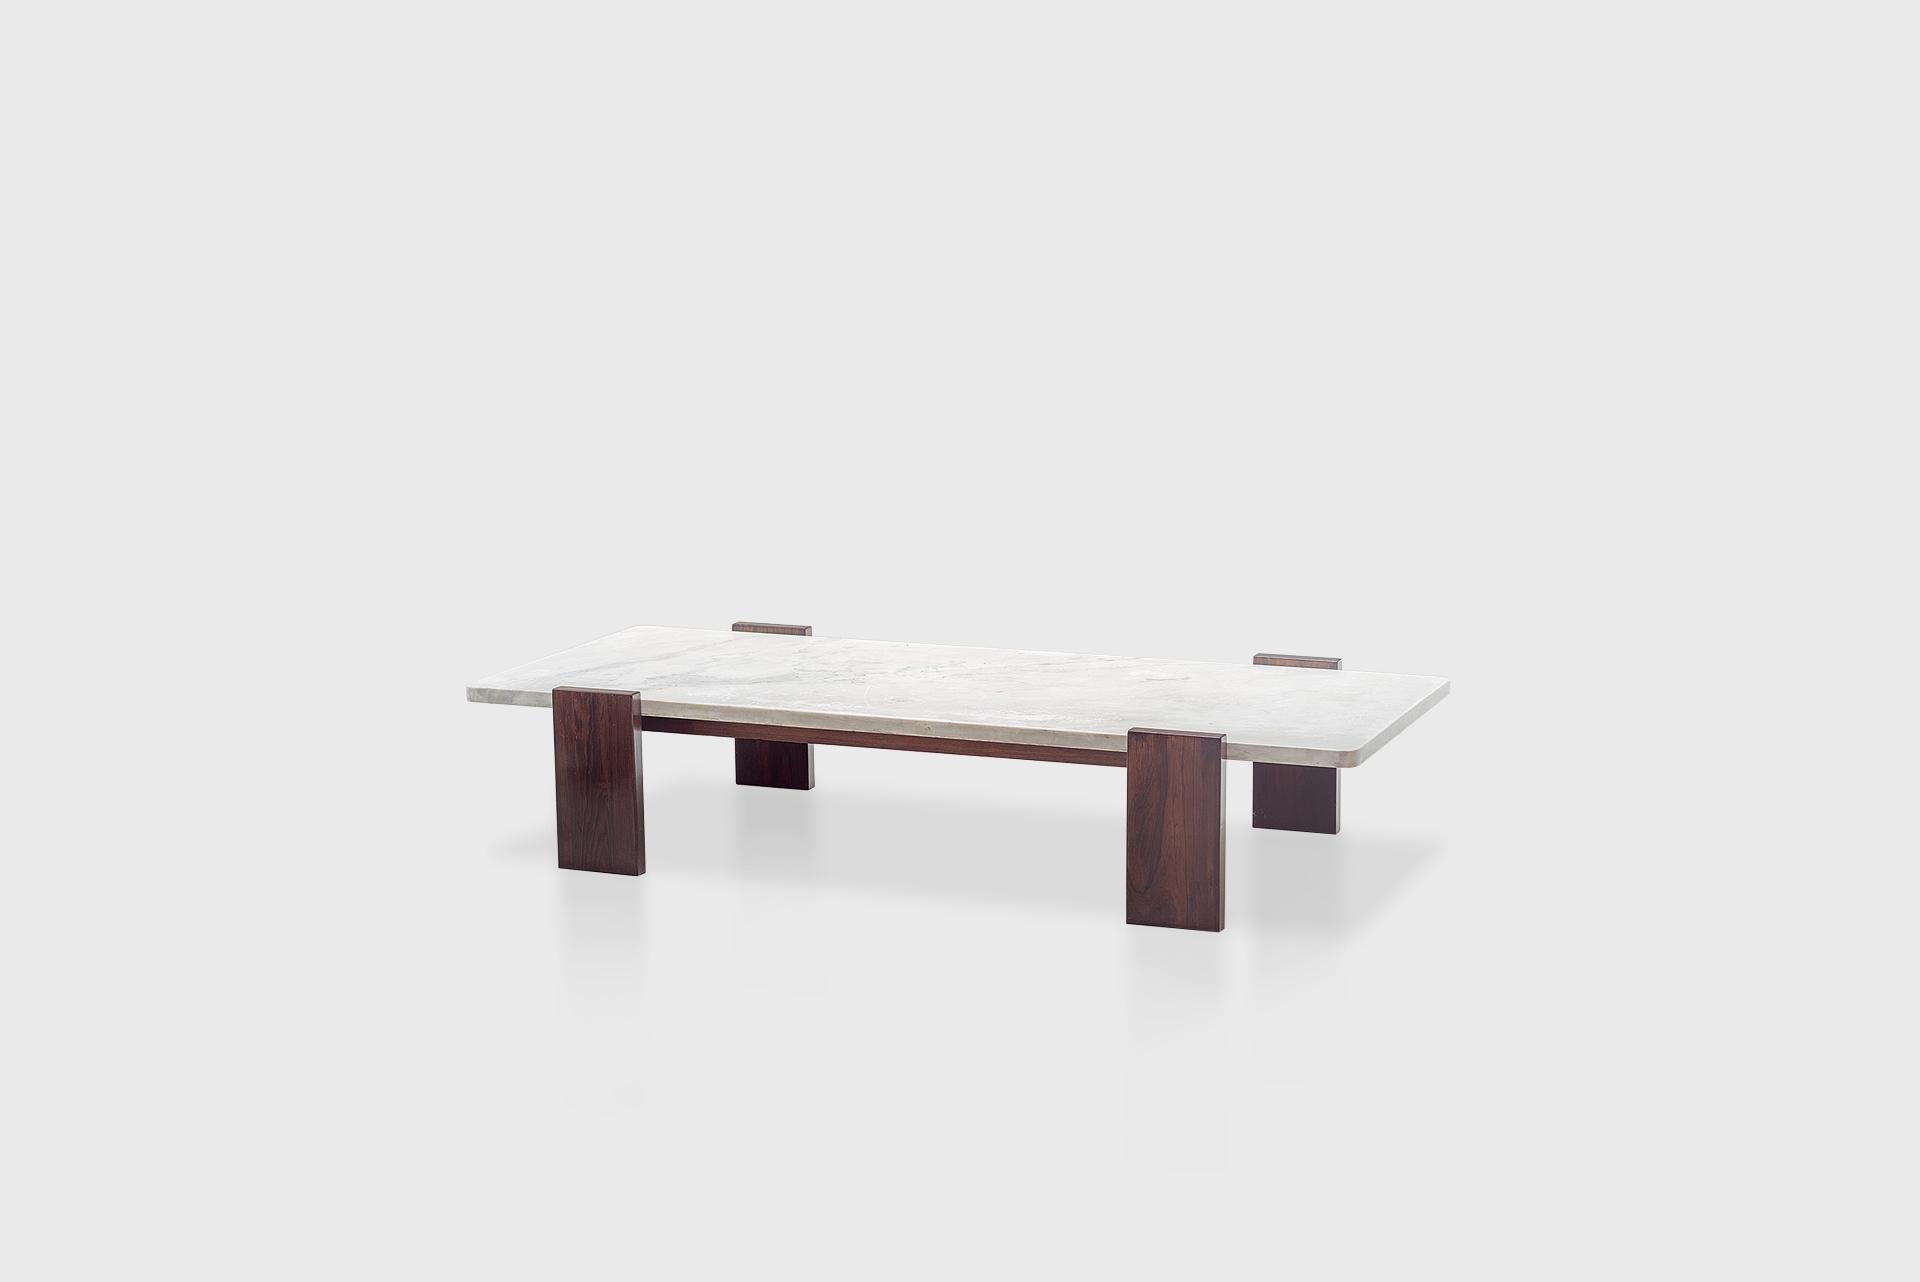 Coffee table Manufactured by Tenreiro Móveis e Decorações Brazil, 1960's Jacaranda wood, marble